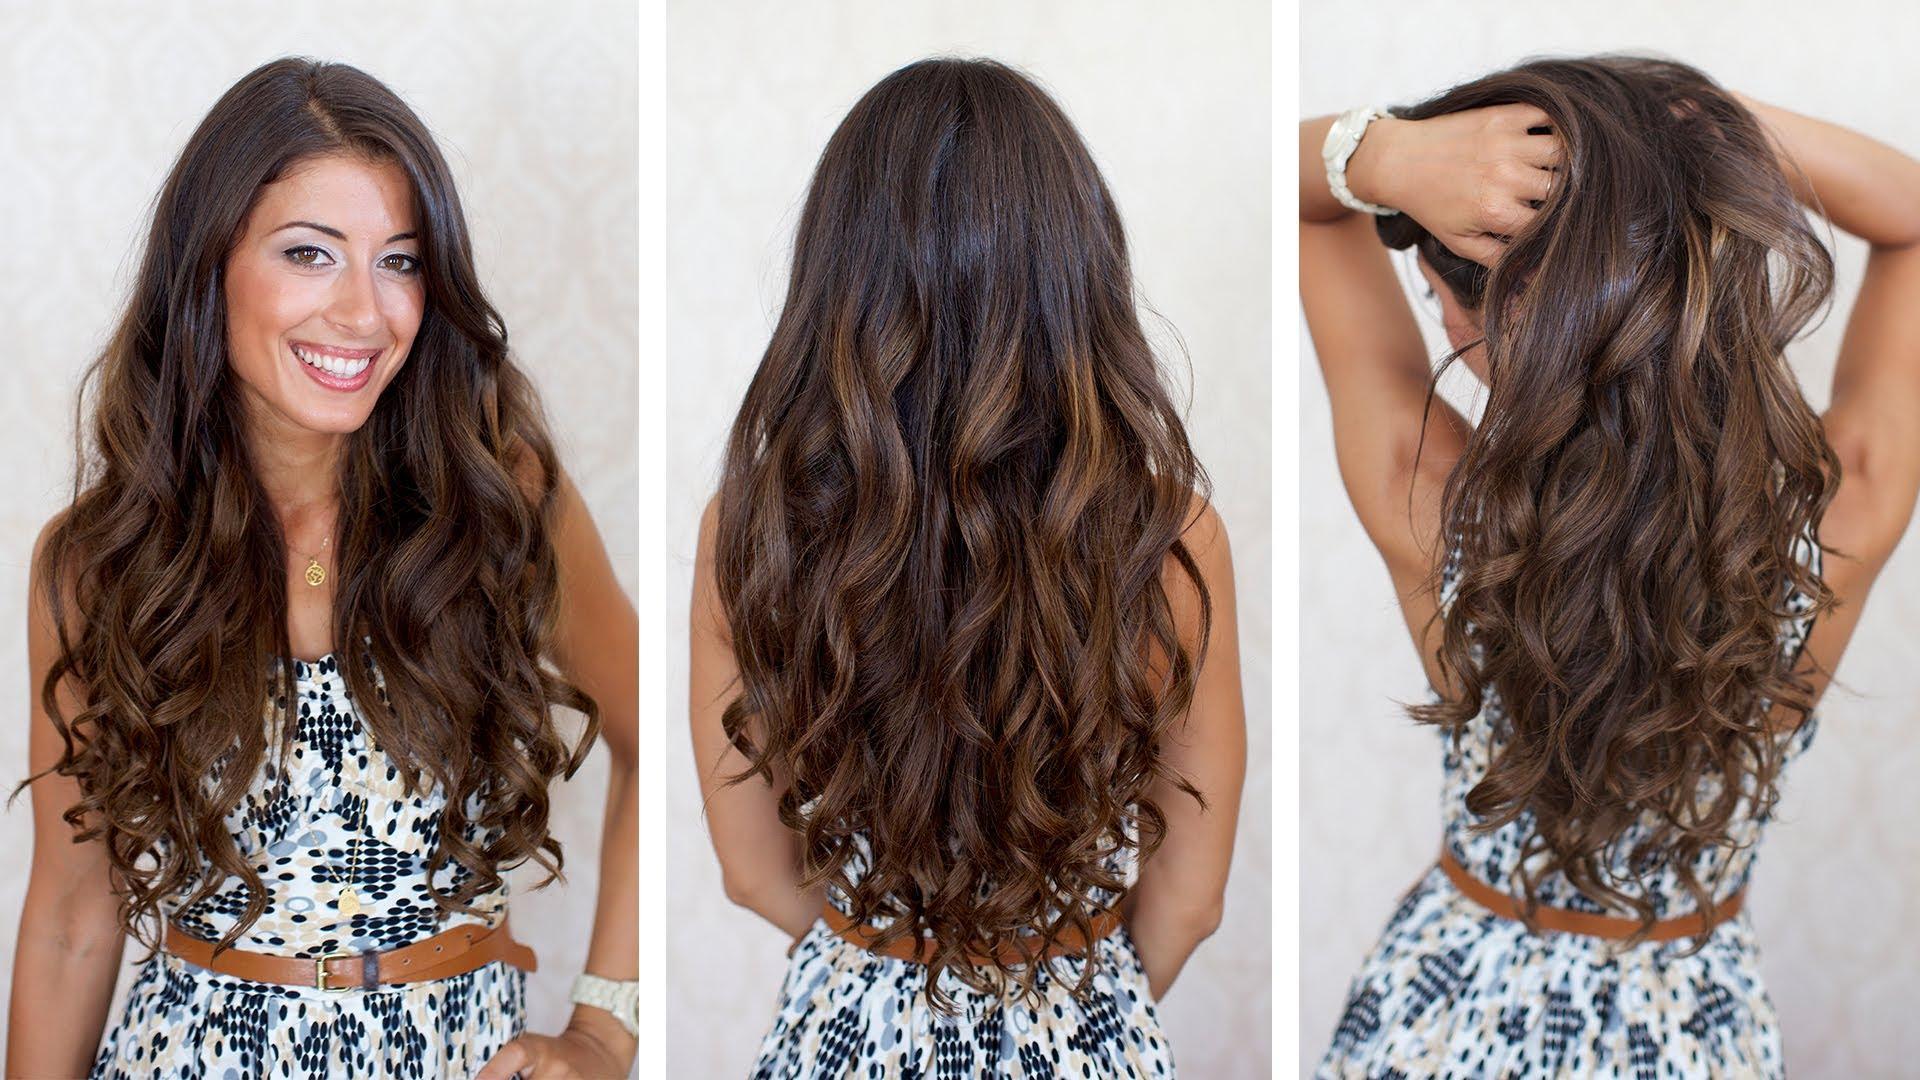 Big Voluminous Curls Hair Diy Fashion Tips Diy Fashion